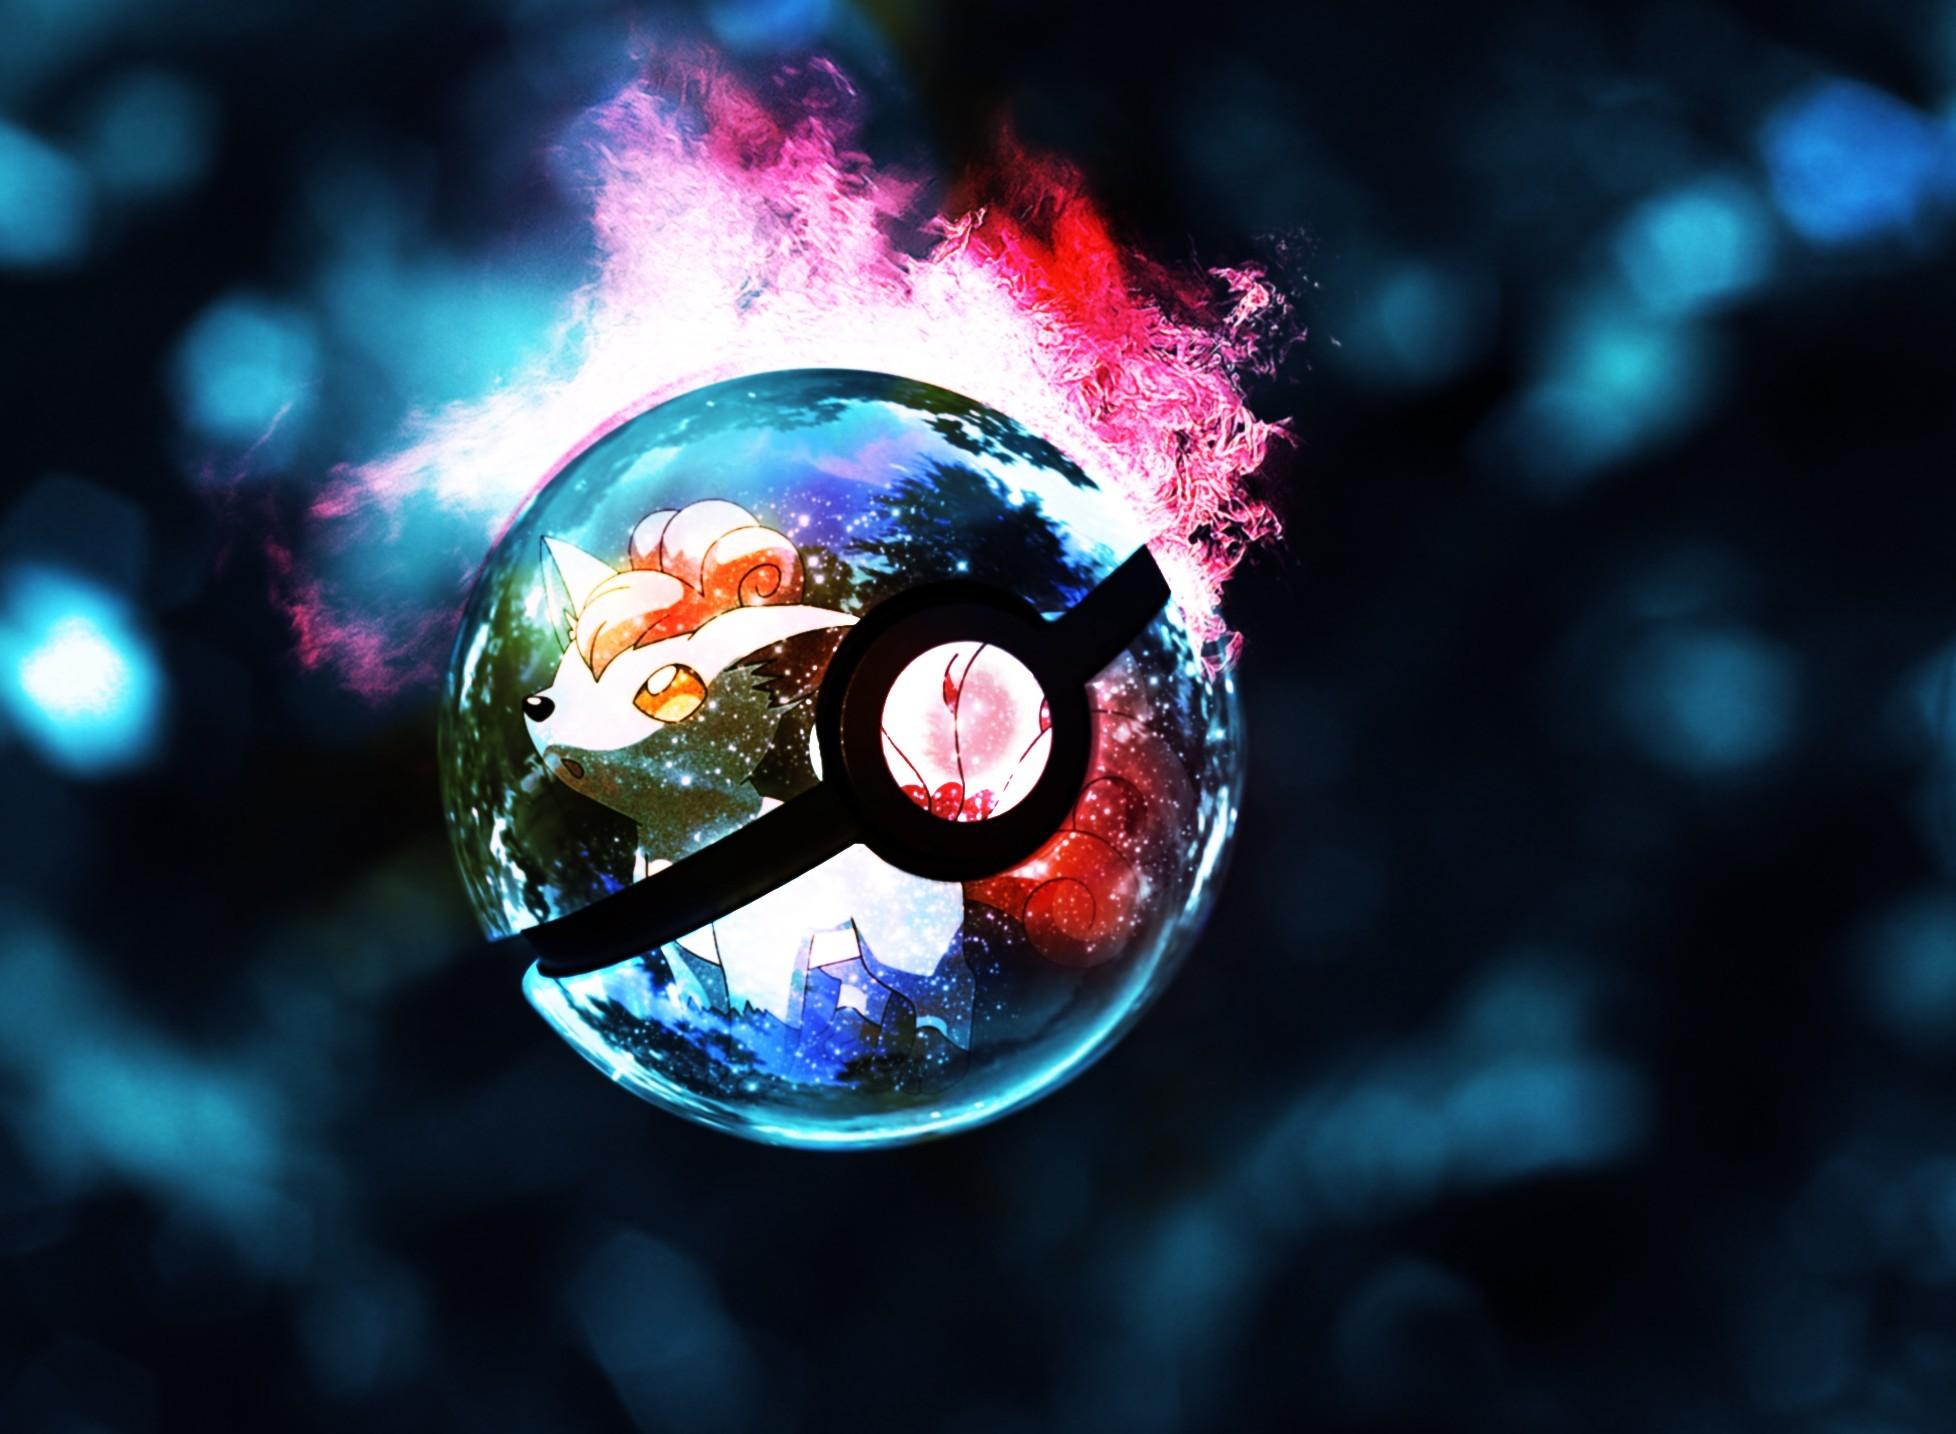 Res: 1956x1434, pokemon · lights · glowing · Pokeball